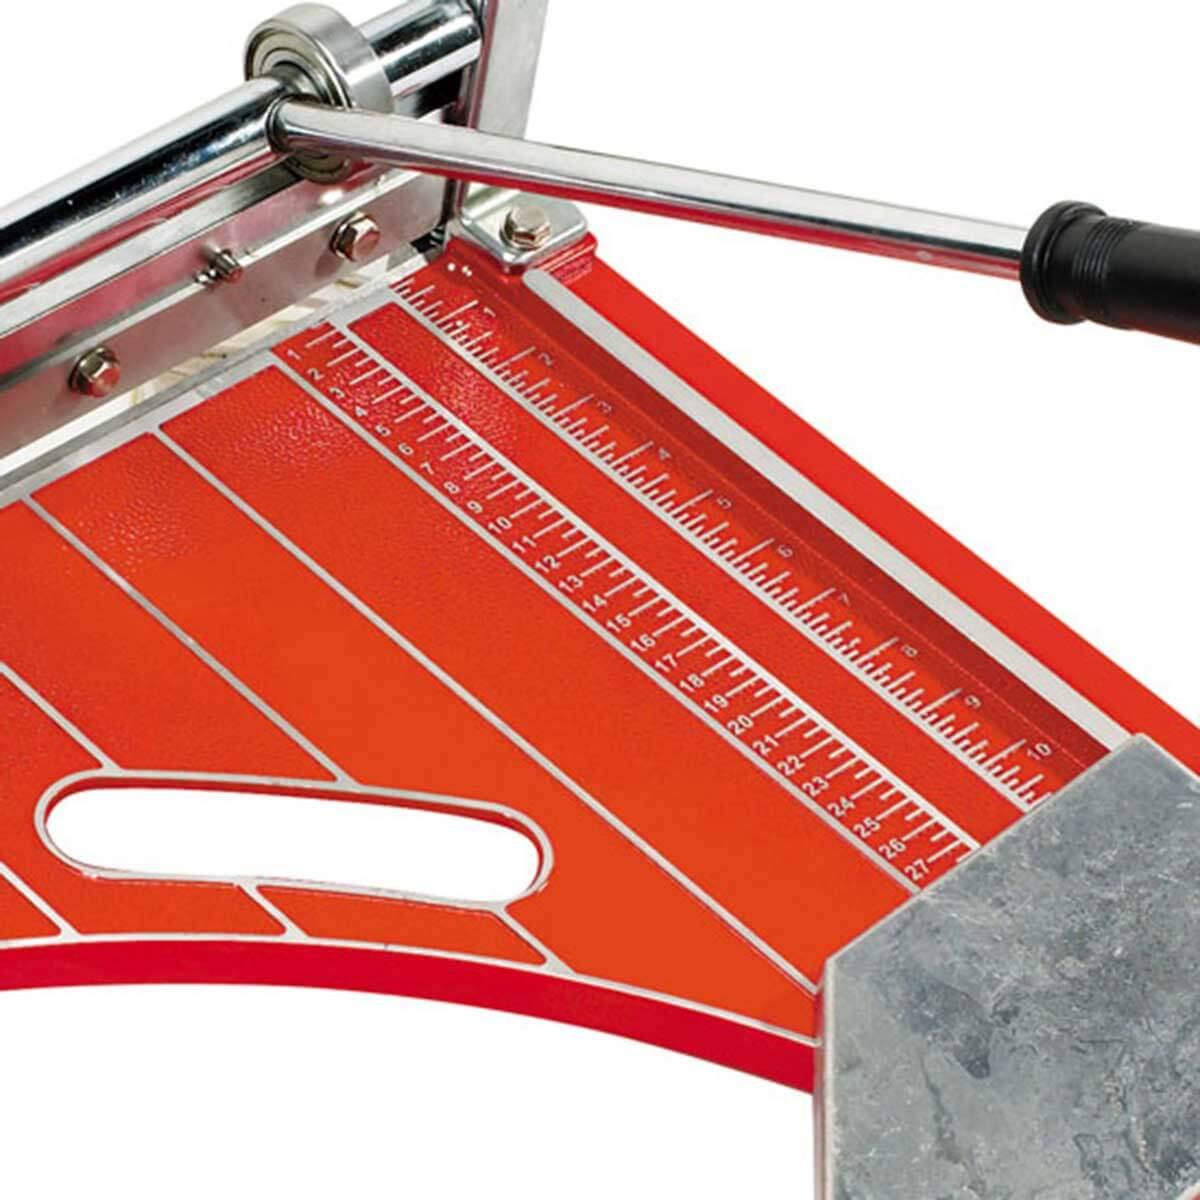 Vinyl Tile Cutters VTC